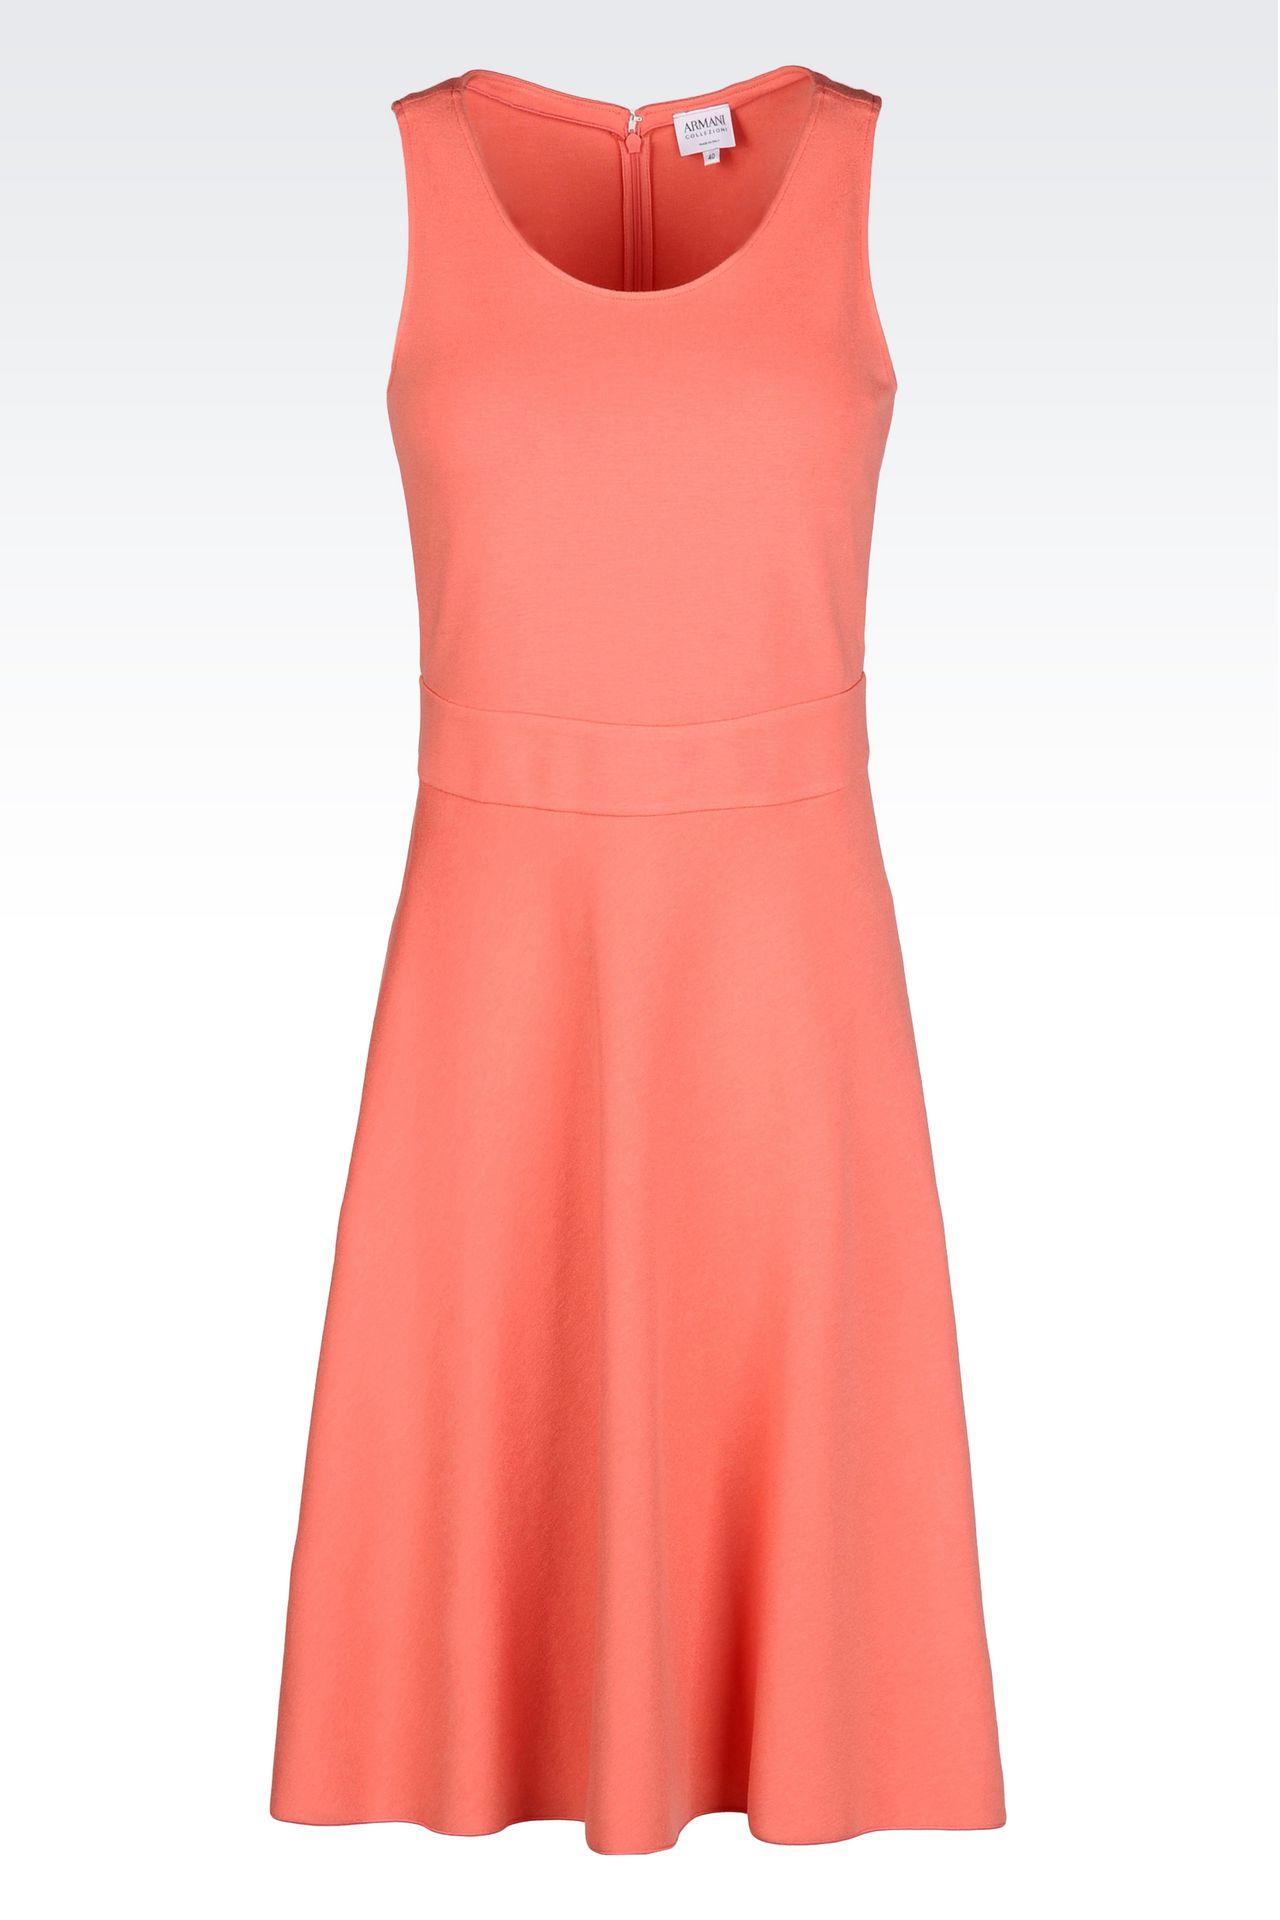 DRESS IN MILANO JERSEY VISCOSE BLEND: Jersey dresses Women by Armani - 0